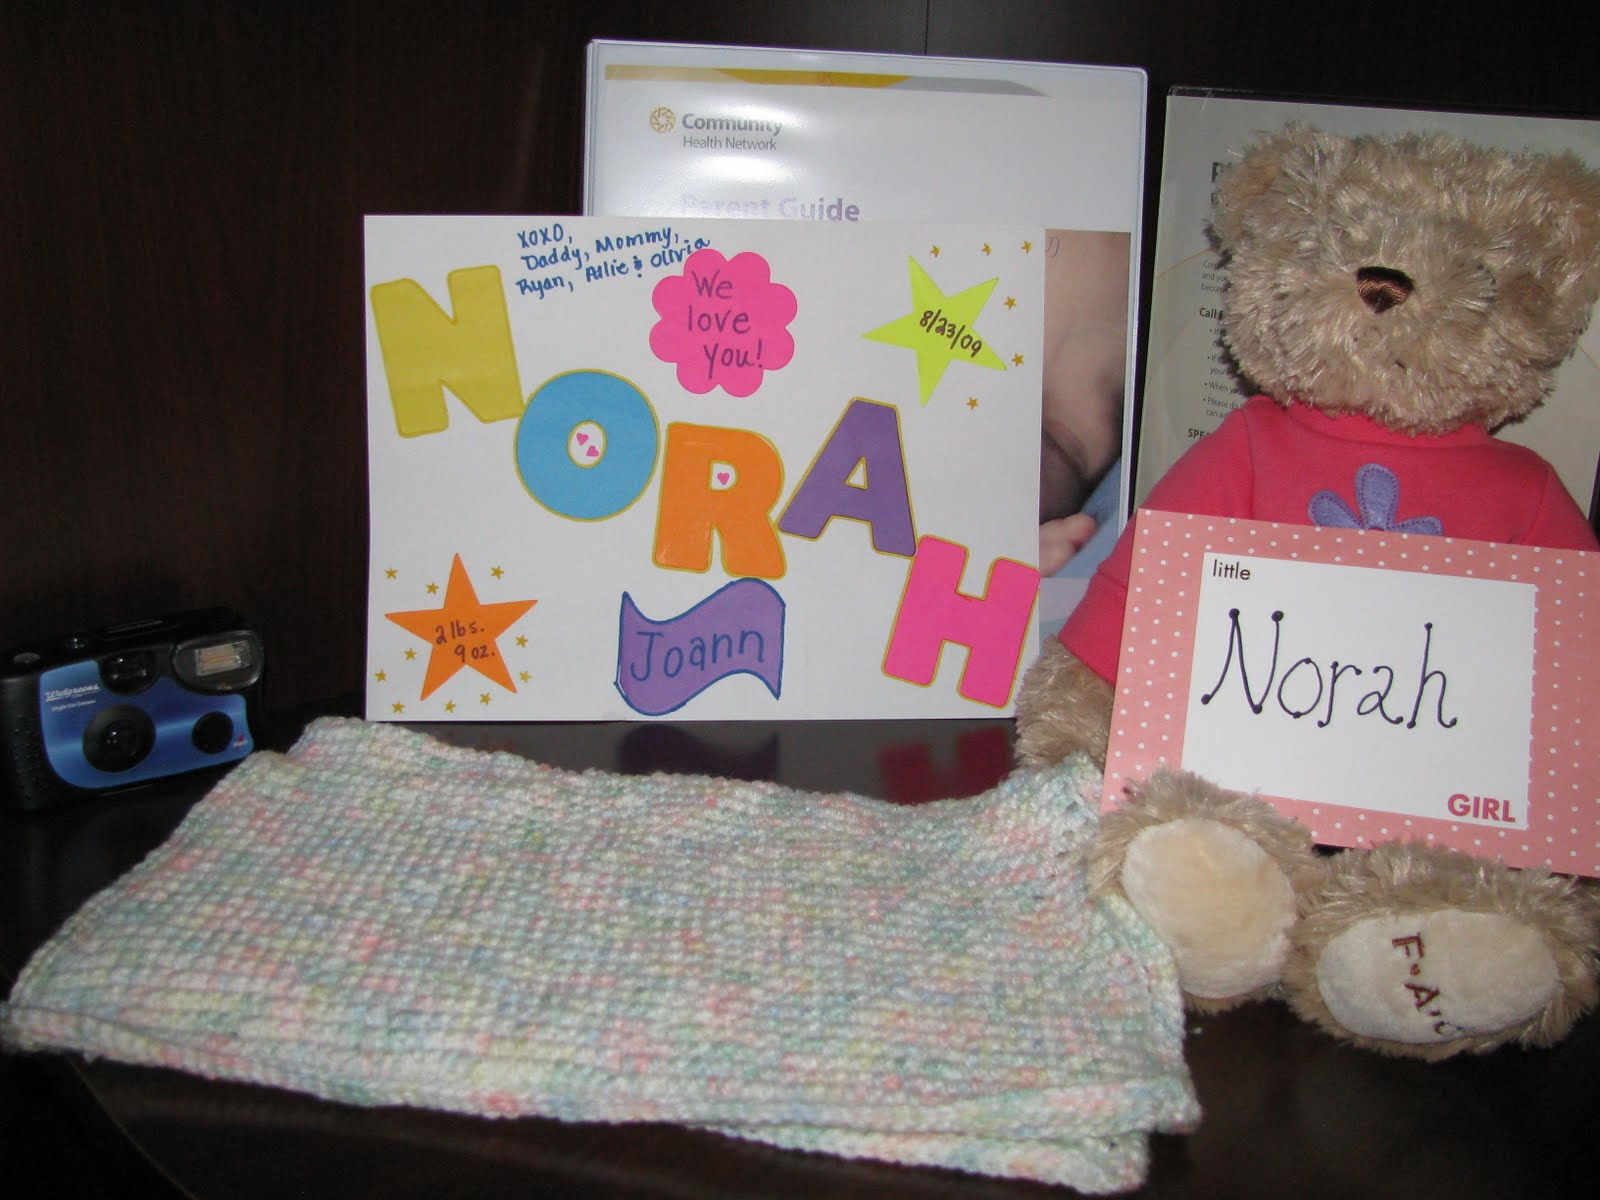 [Norah+Joann]